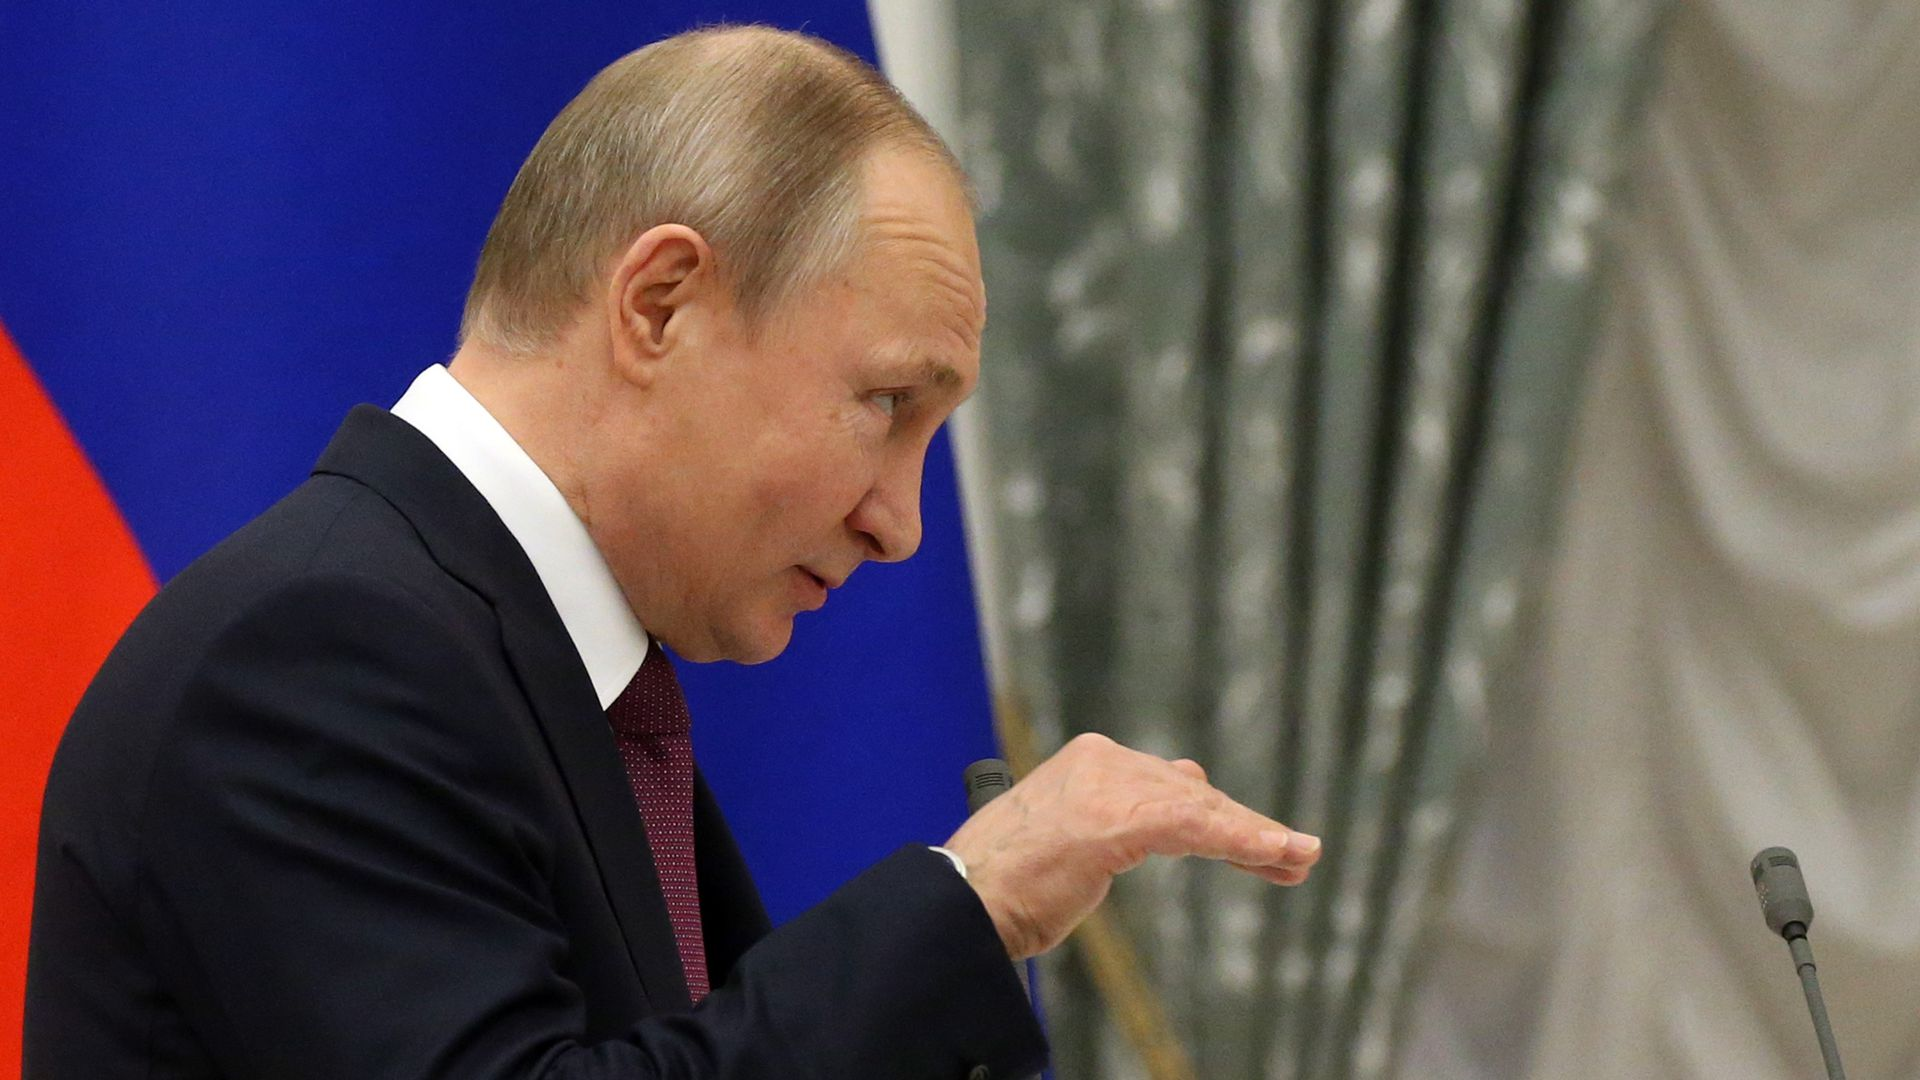 Vladimir Putin gestures with his hand.